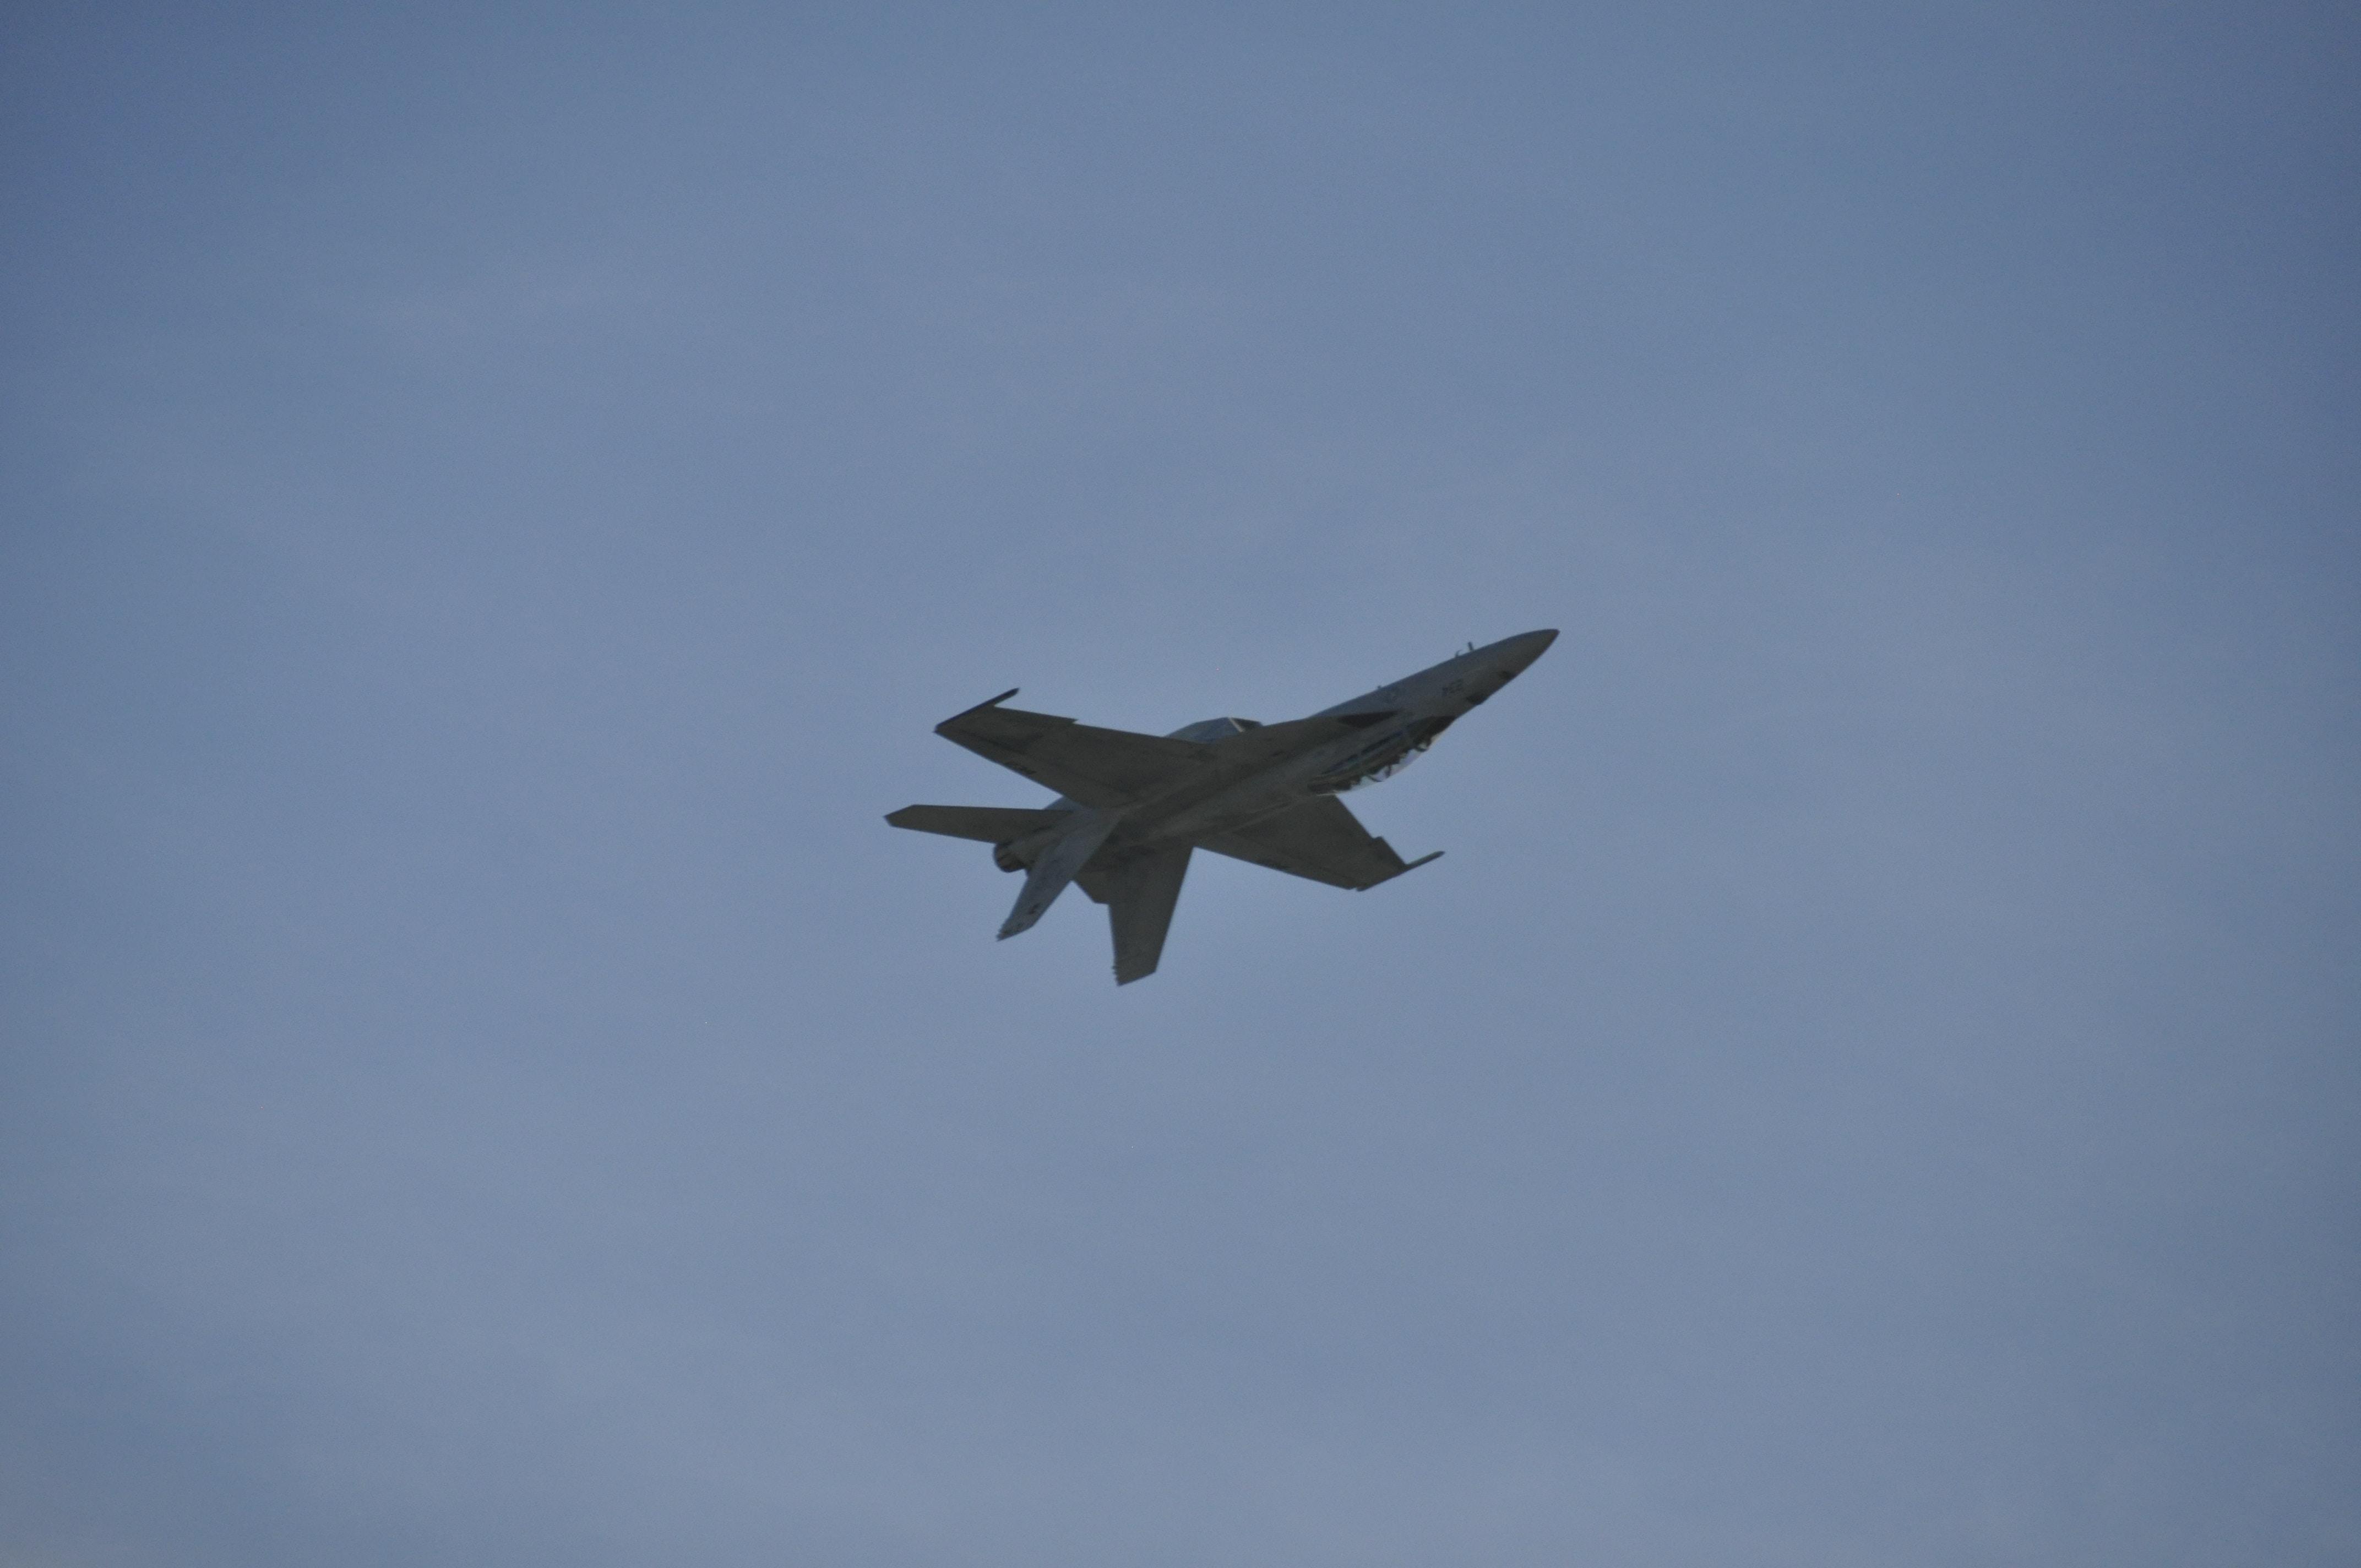 grey aircraft